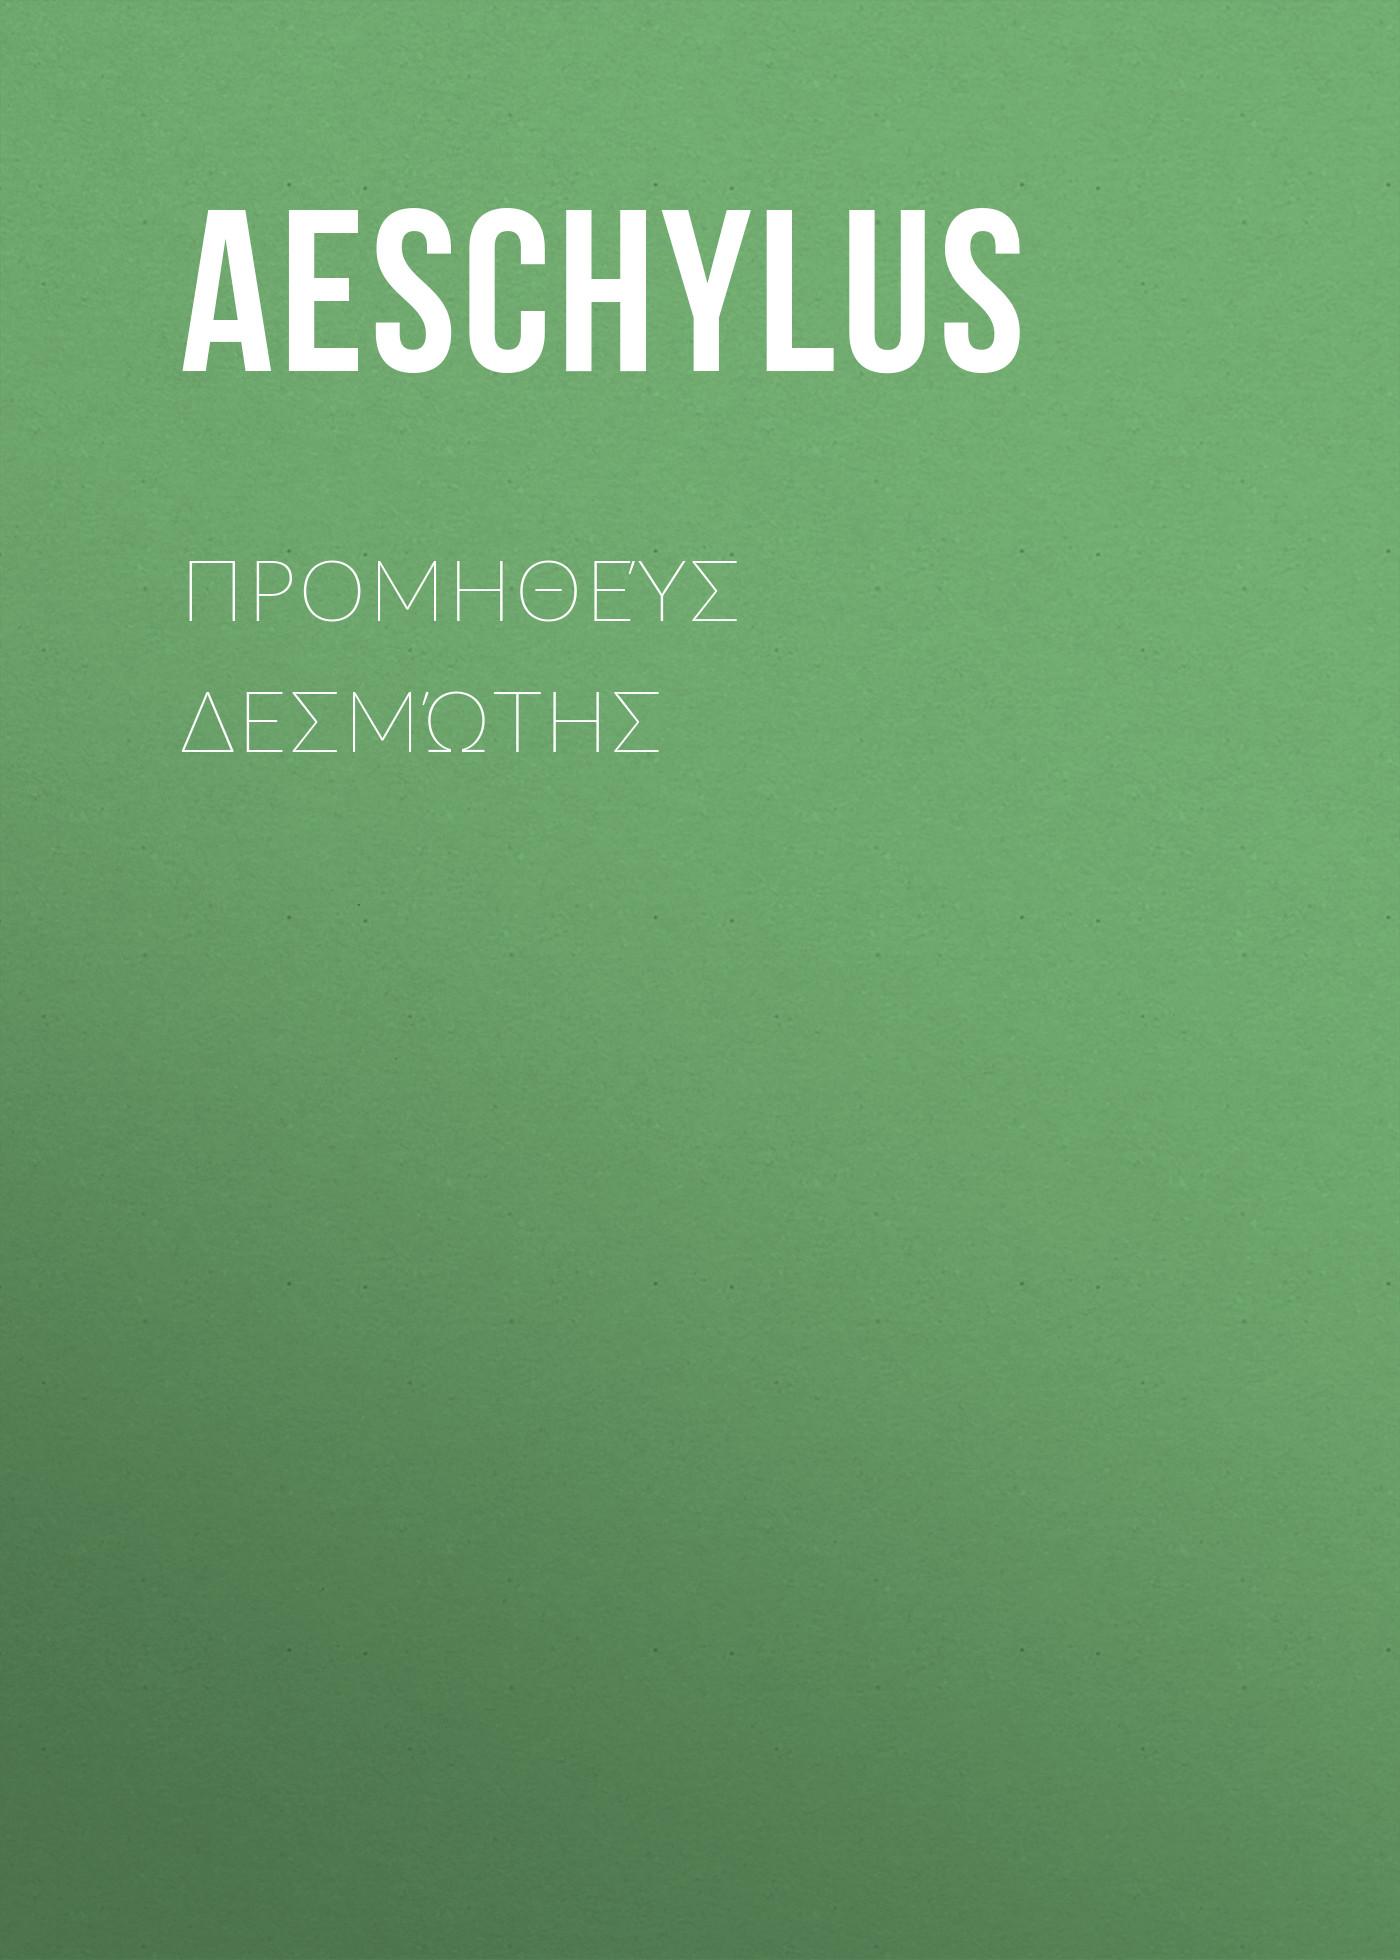 Aeschylus Προμηθεύς Δεσμώτης johannes minckwitz aeschylus aeschyli tragoediae quae supersunt deperditarum fabularum fragmenta et scholia graeca promentheus vinctus latin edition